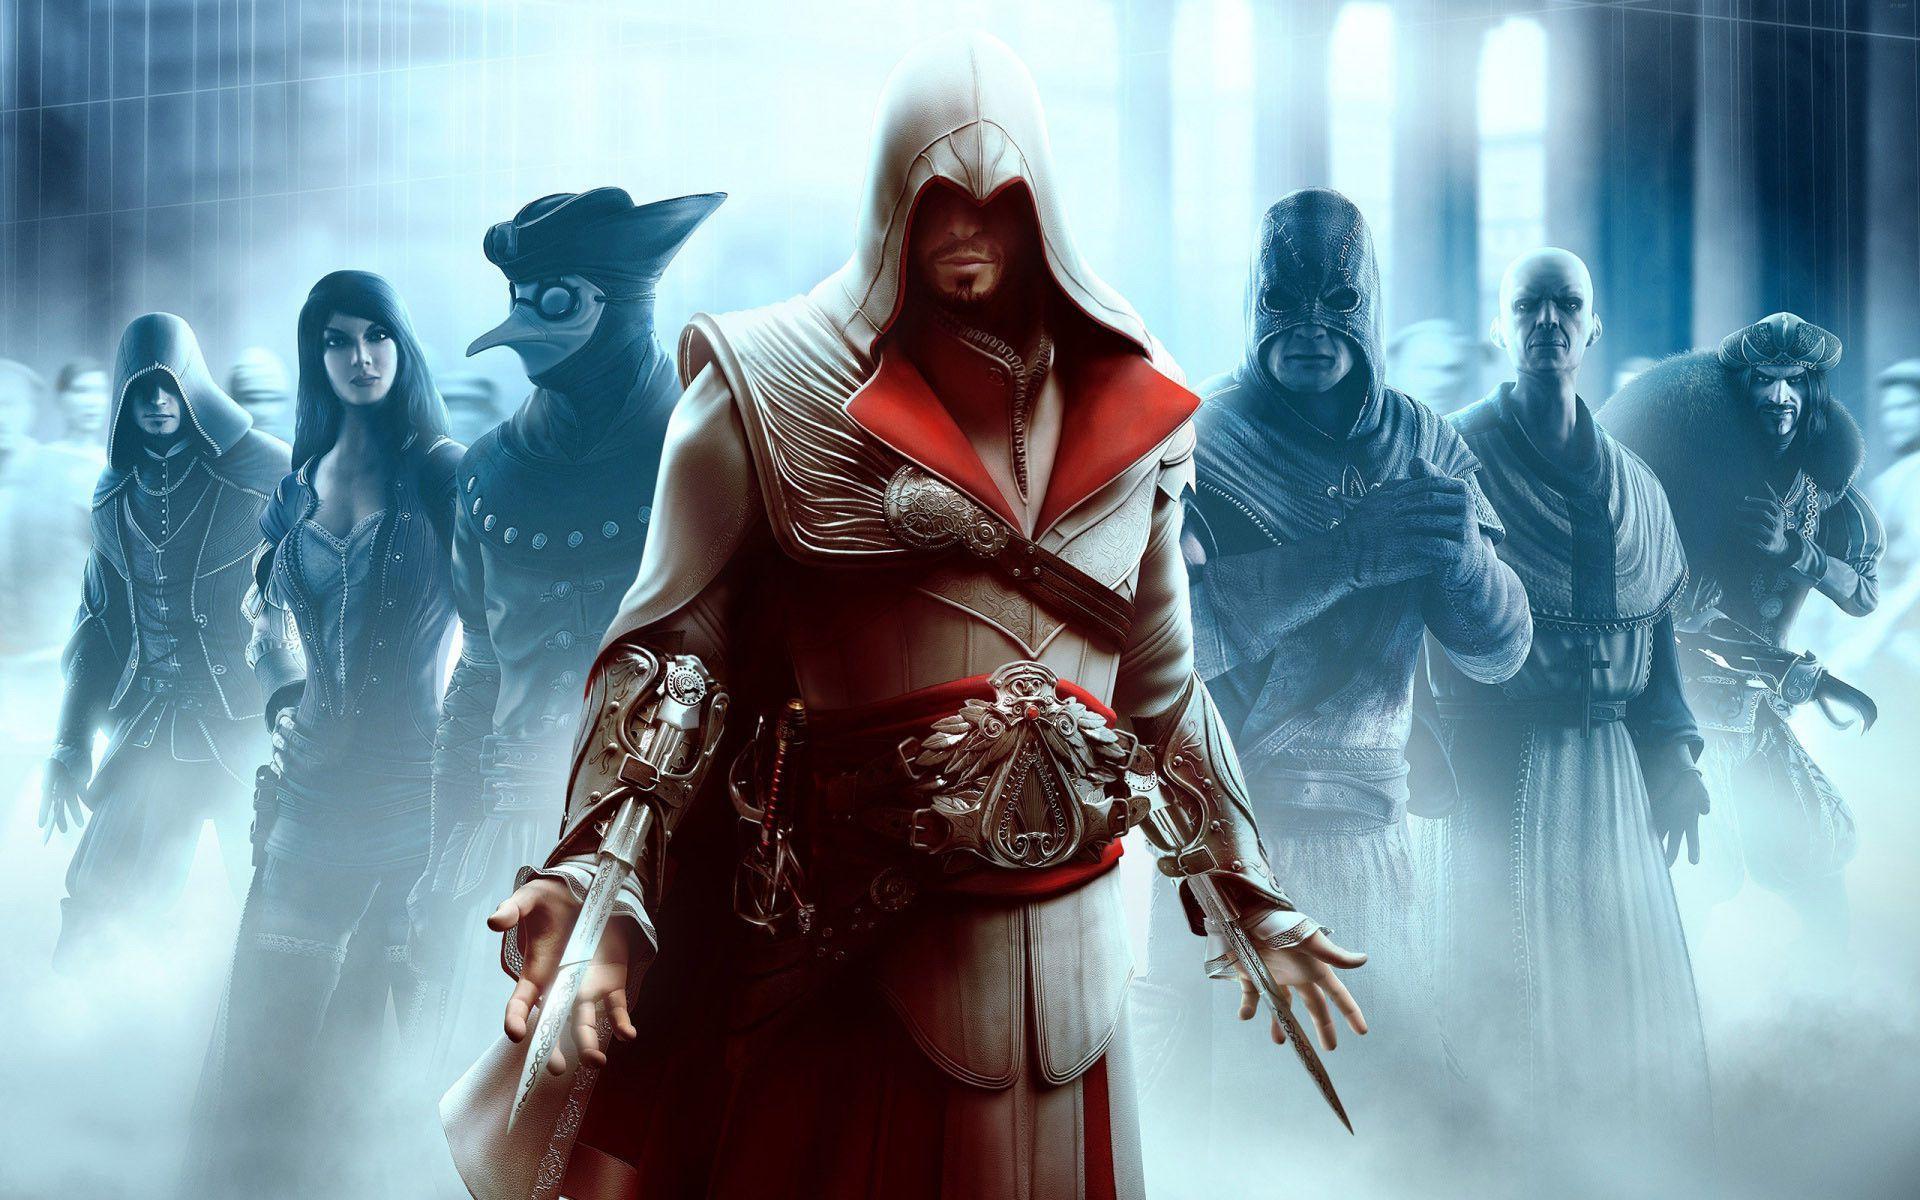 Assassin S Creed Brotherhood Wallpapers Top Free Assassin S Creed Brotherhood Backgrounds Wallpaperaccess